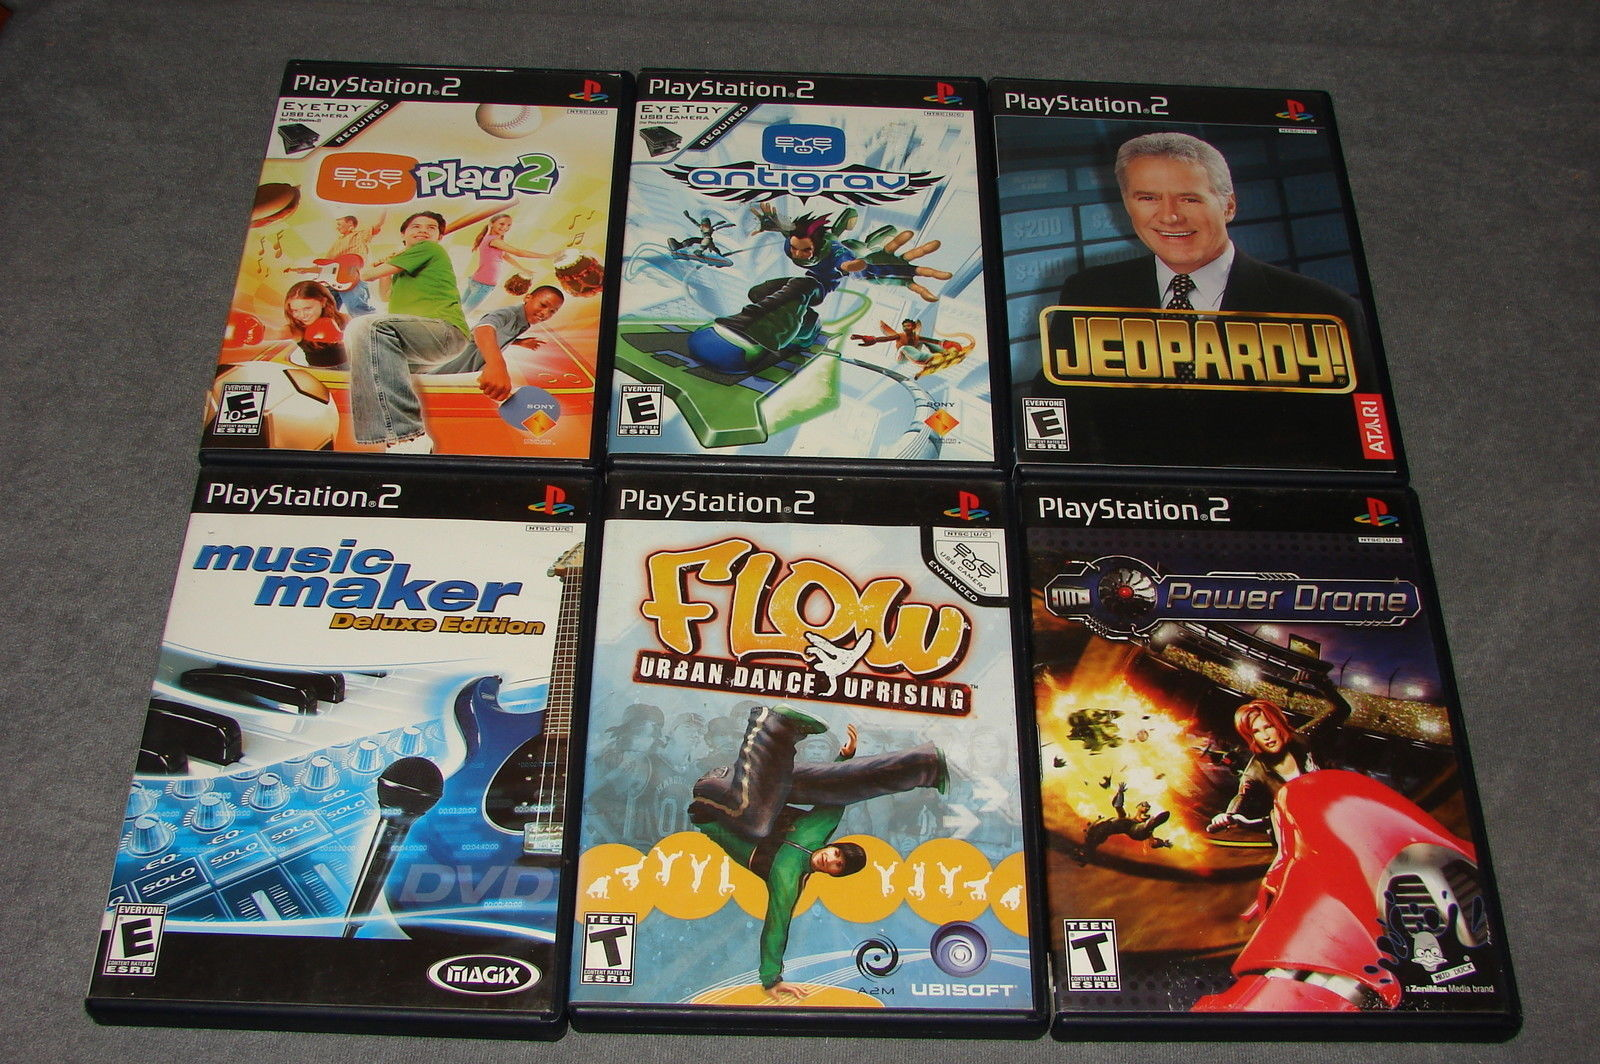 Playstation 2 PS2: 6 Game Lot - Power Drome + Jeopardy + Antigrav + Eyetoy Play